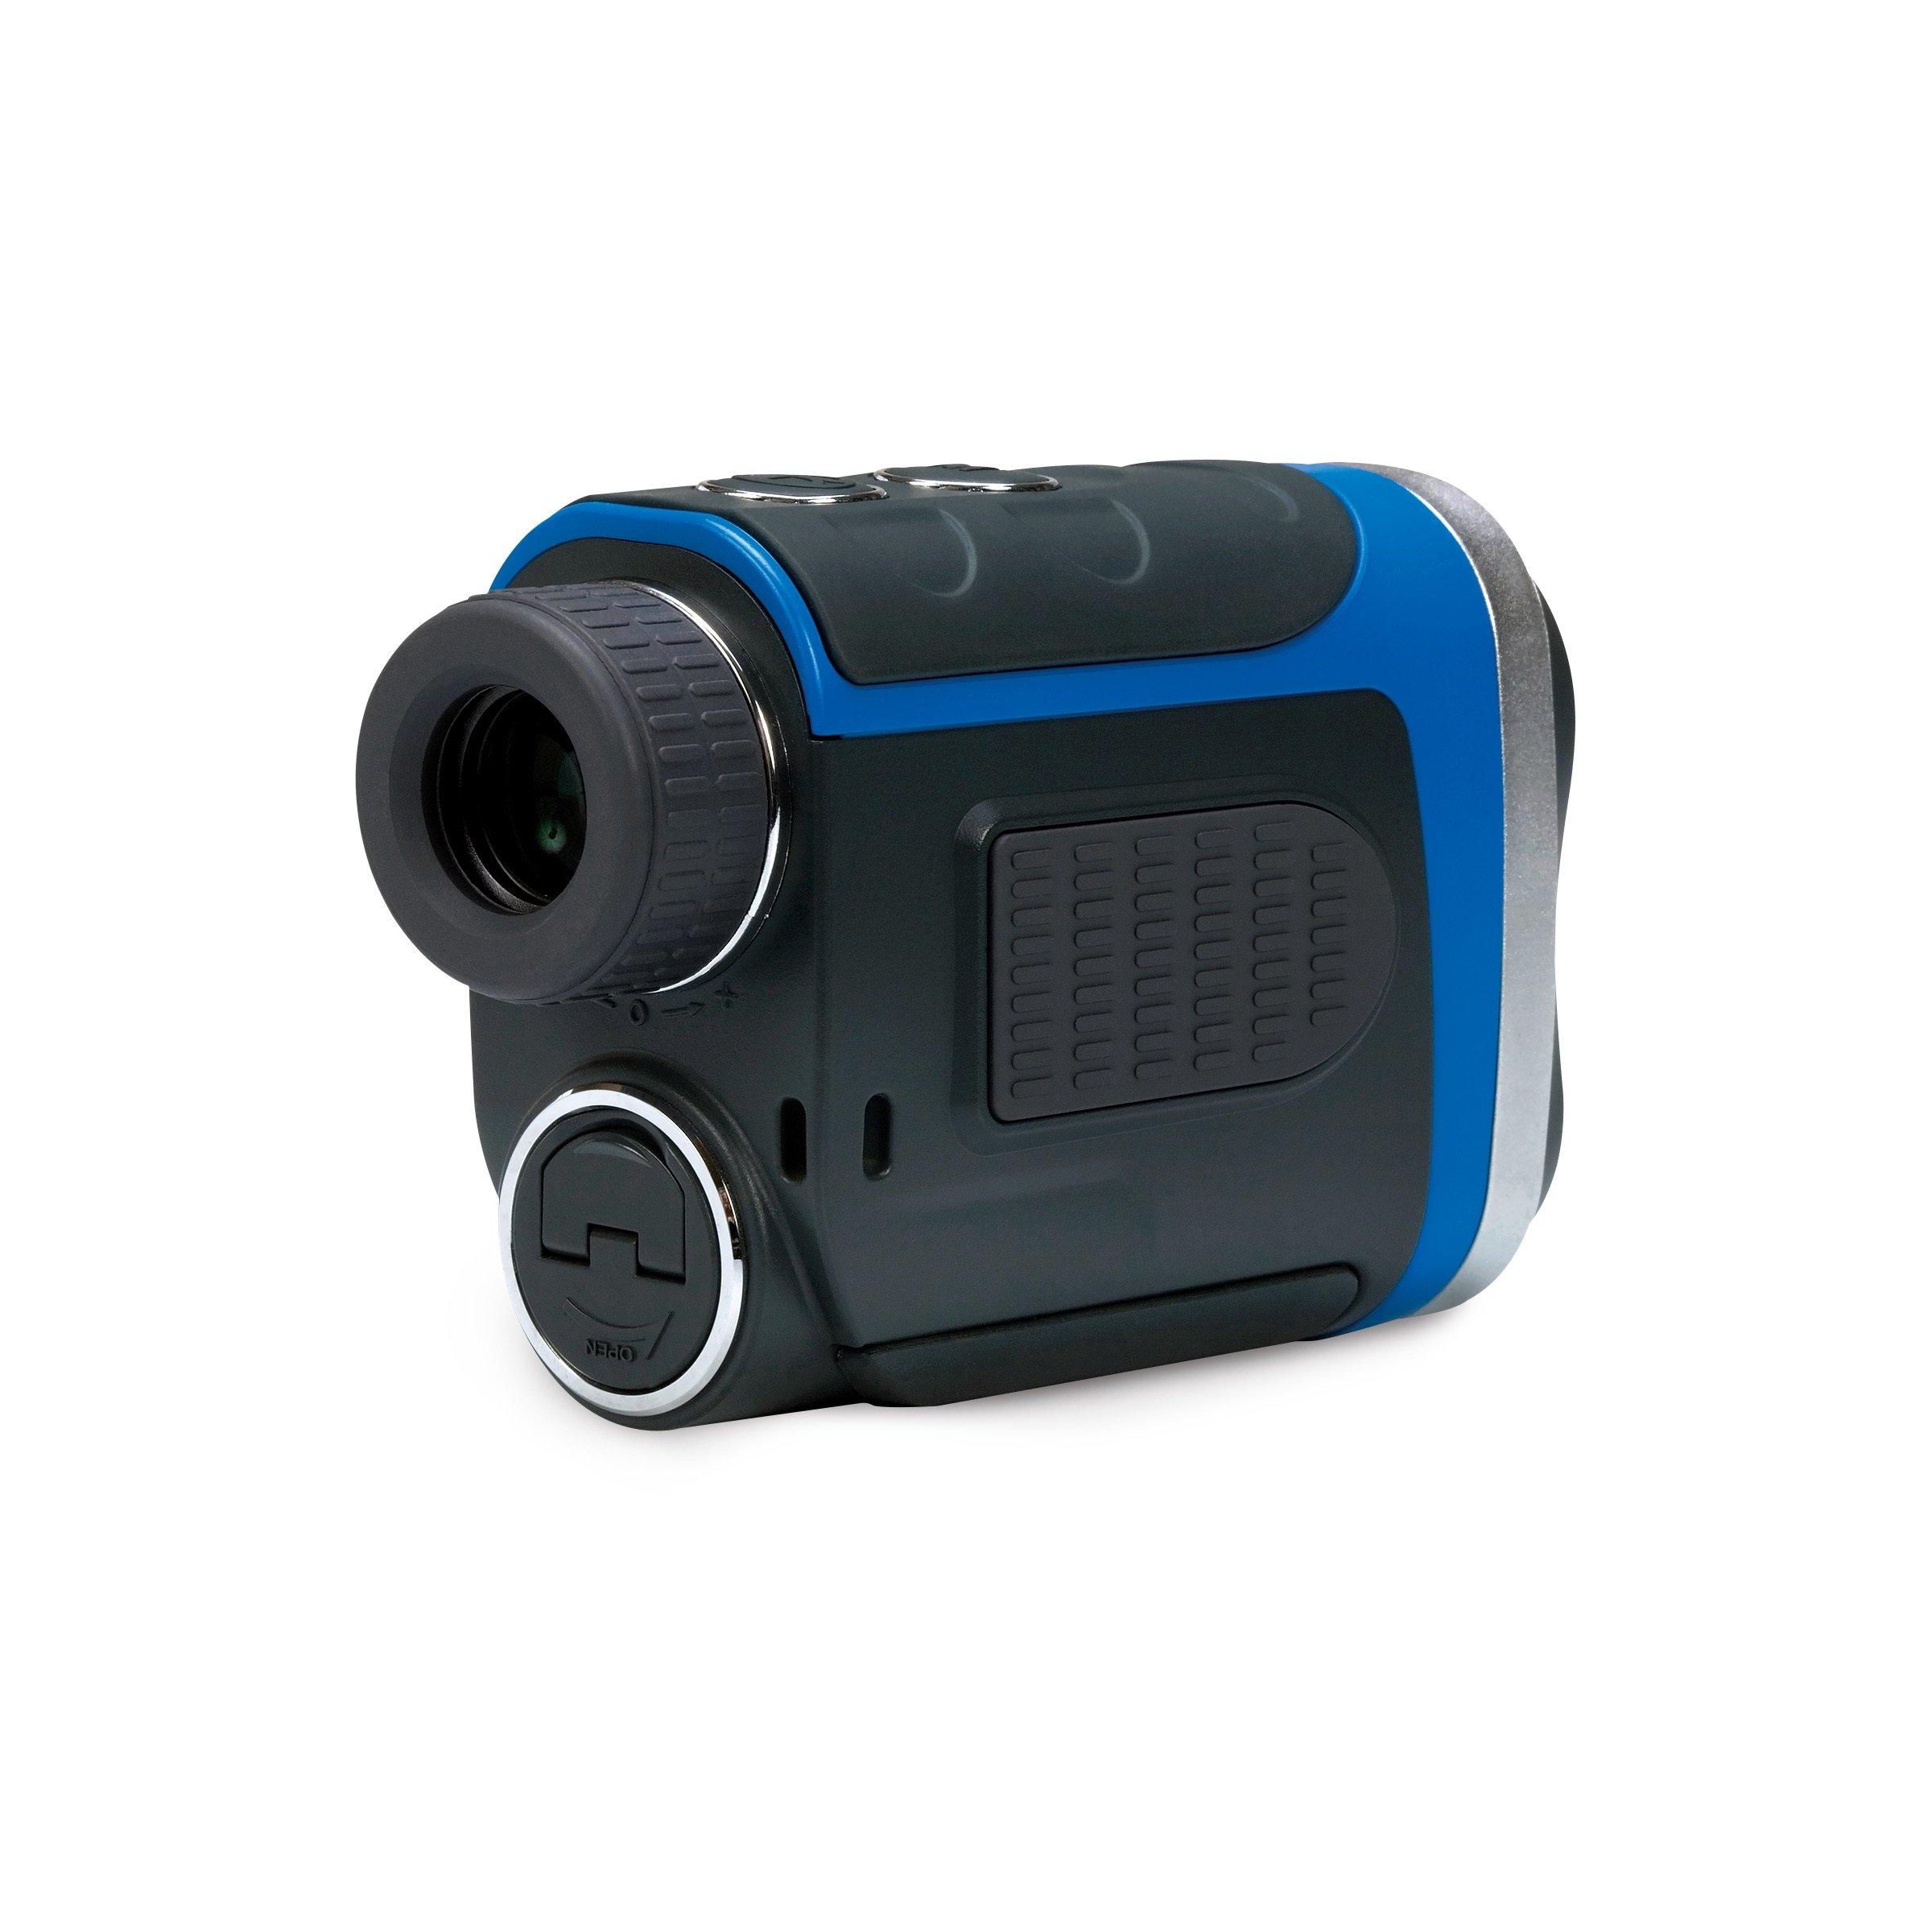 GolfBuddy LR5S Golf Laser Rangefinder with Slope, Dark Gray/Blue by GolfBuddy (Image #5)